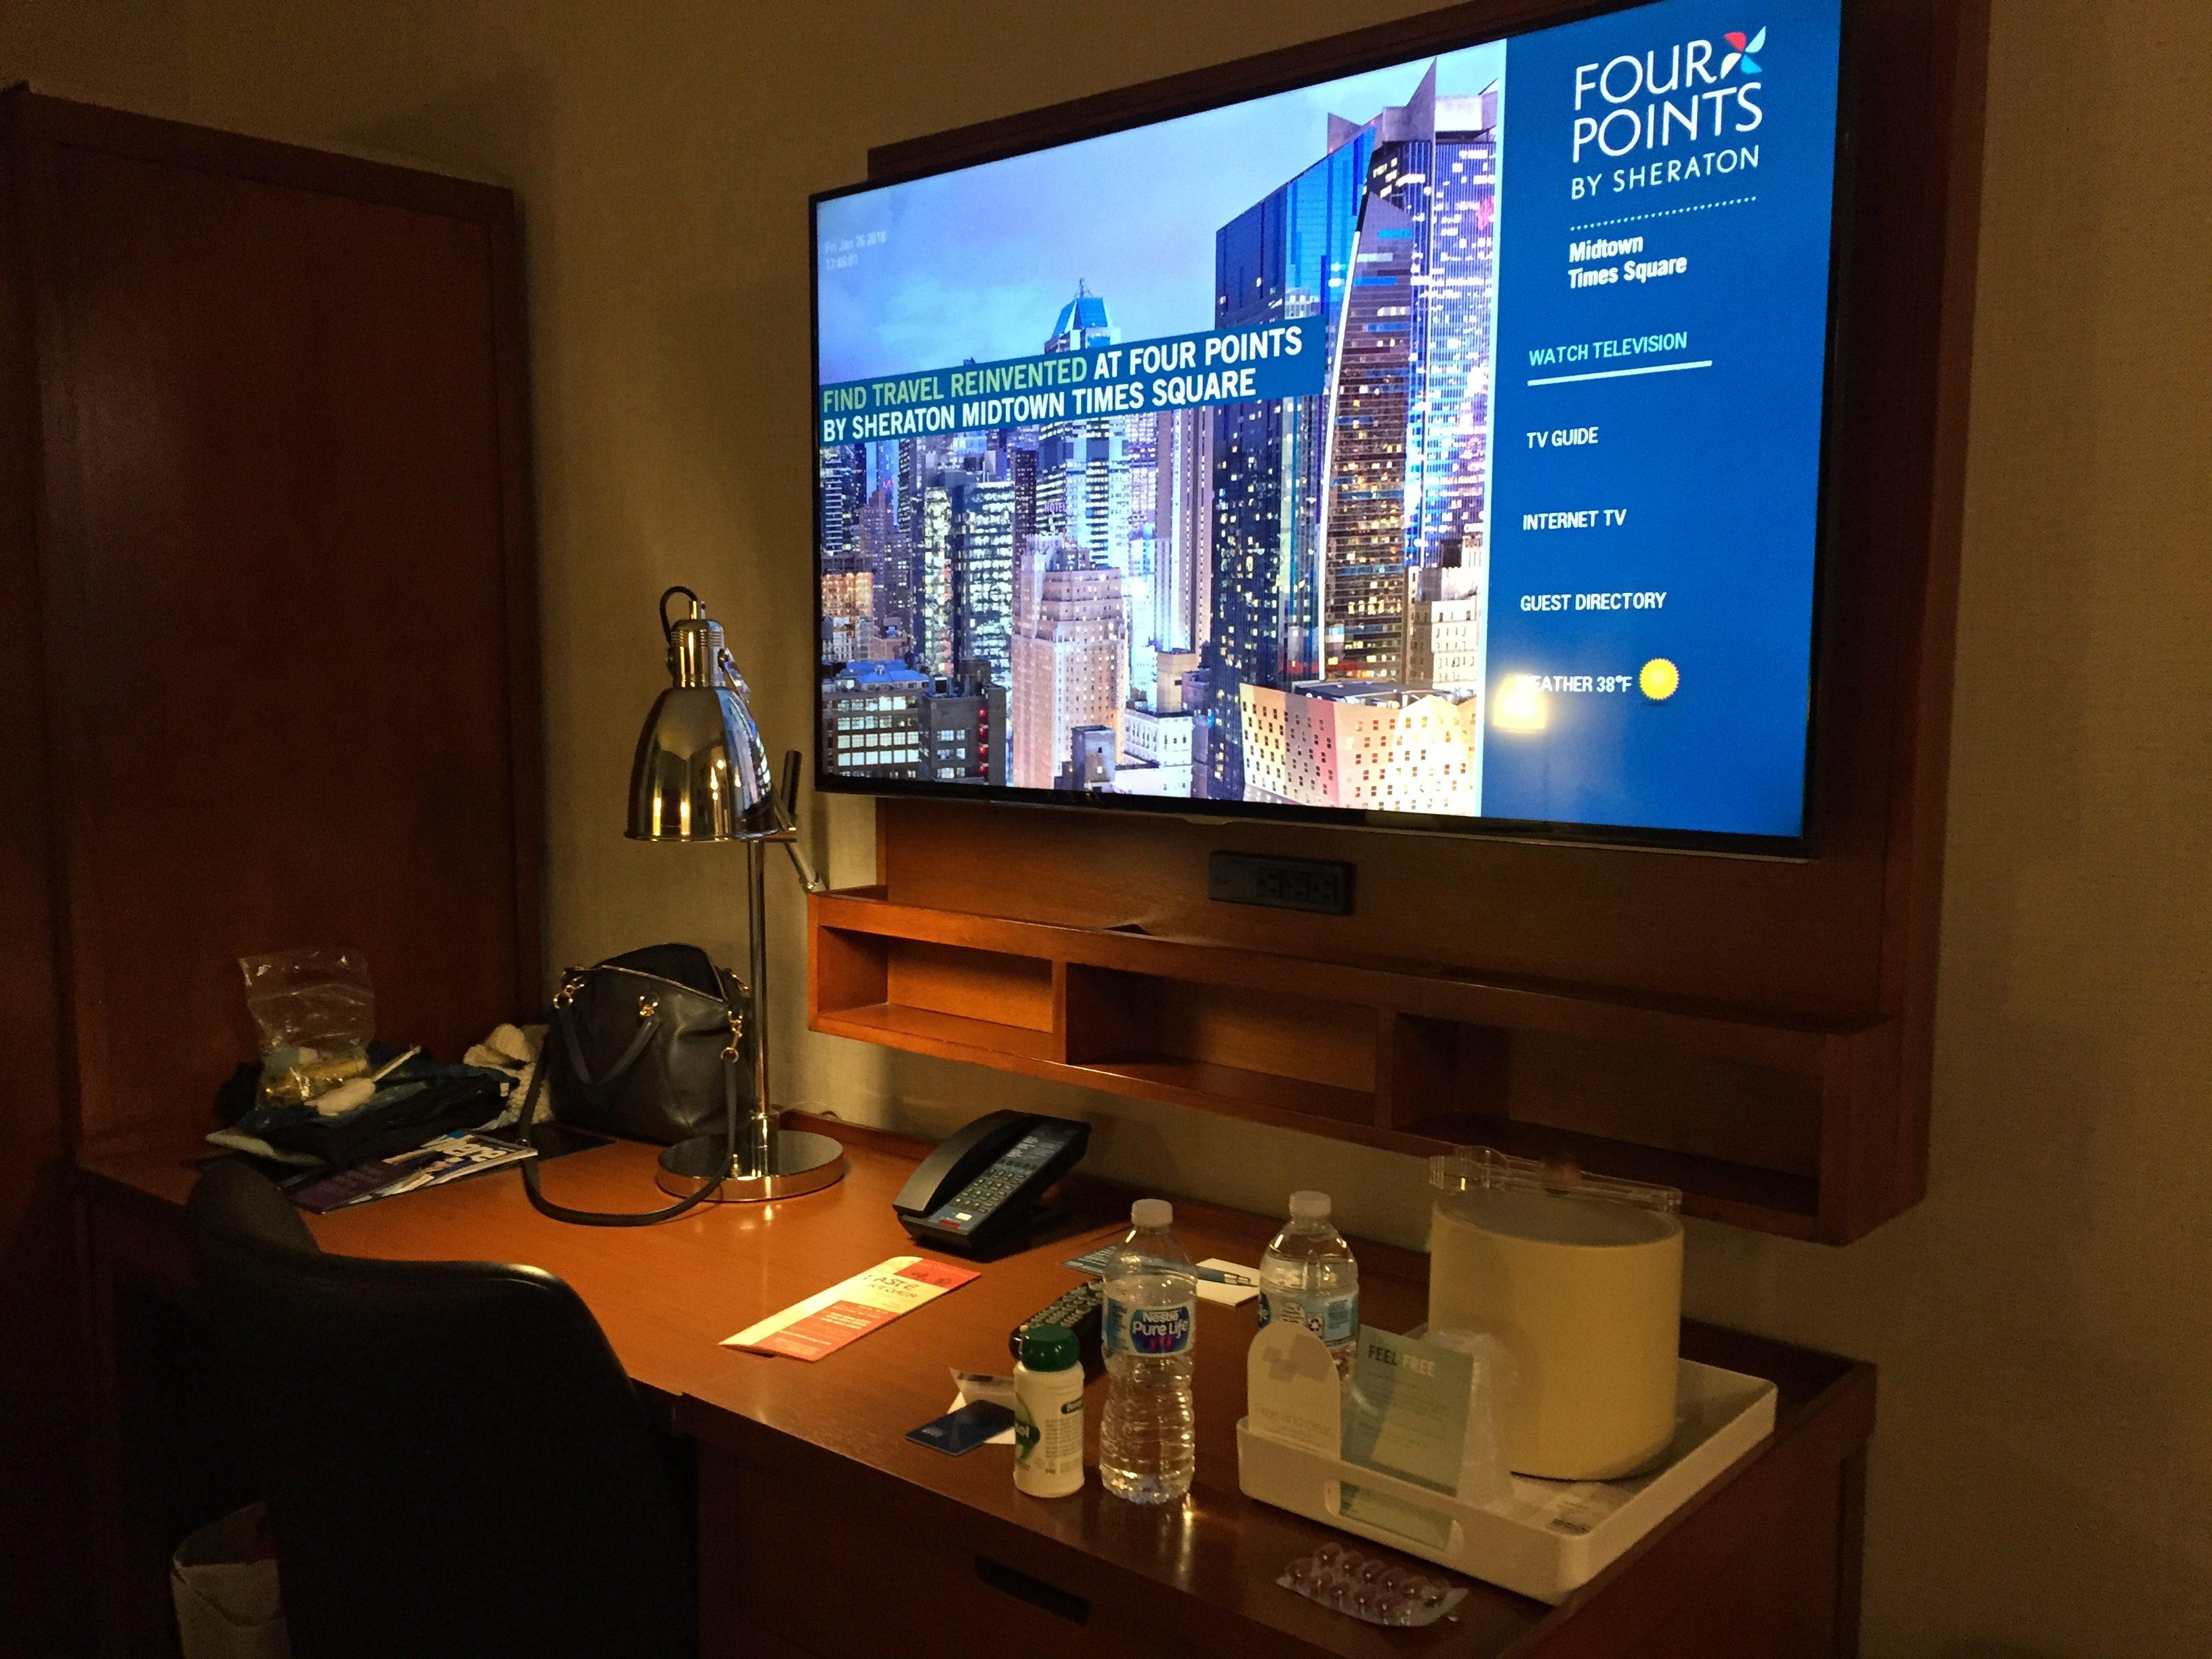 IMG 35431 e1517837393777 - El Hotel Four Points by Sheraton en Manhattan New York